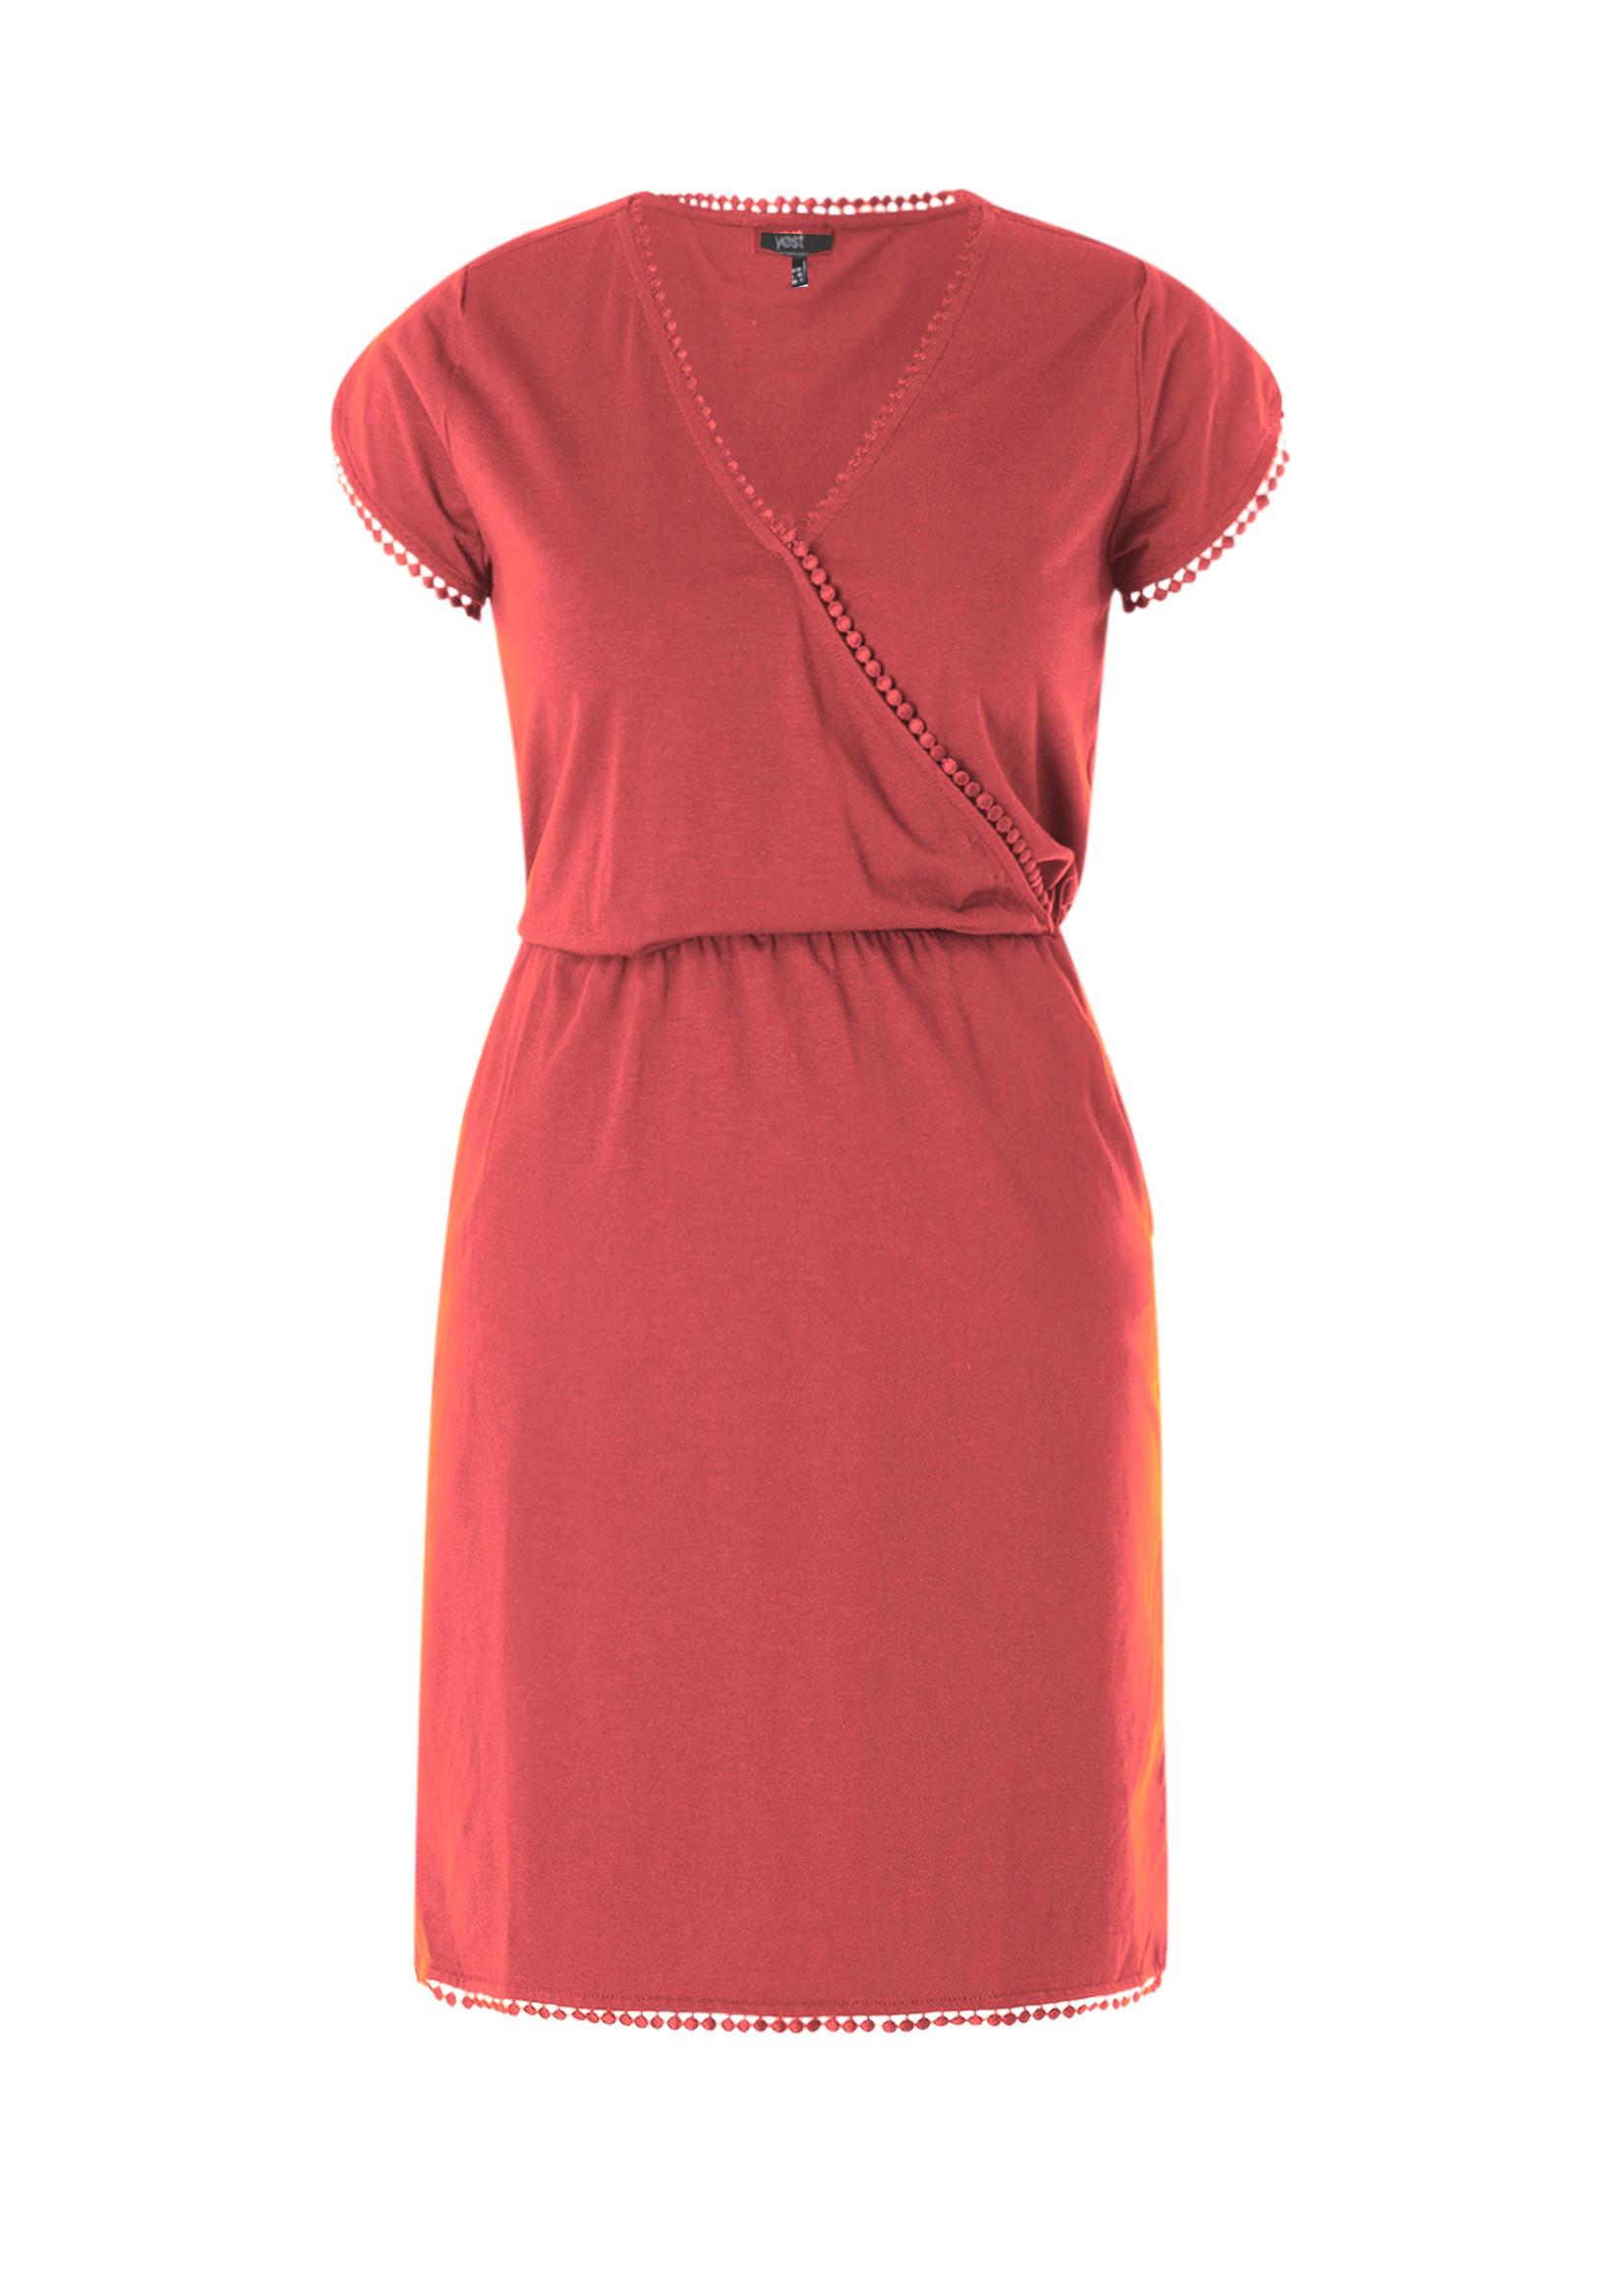 Yesta Yesta Linde Dress